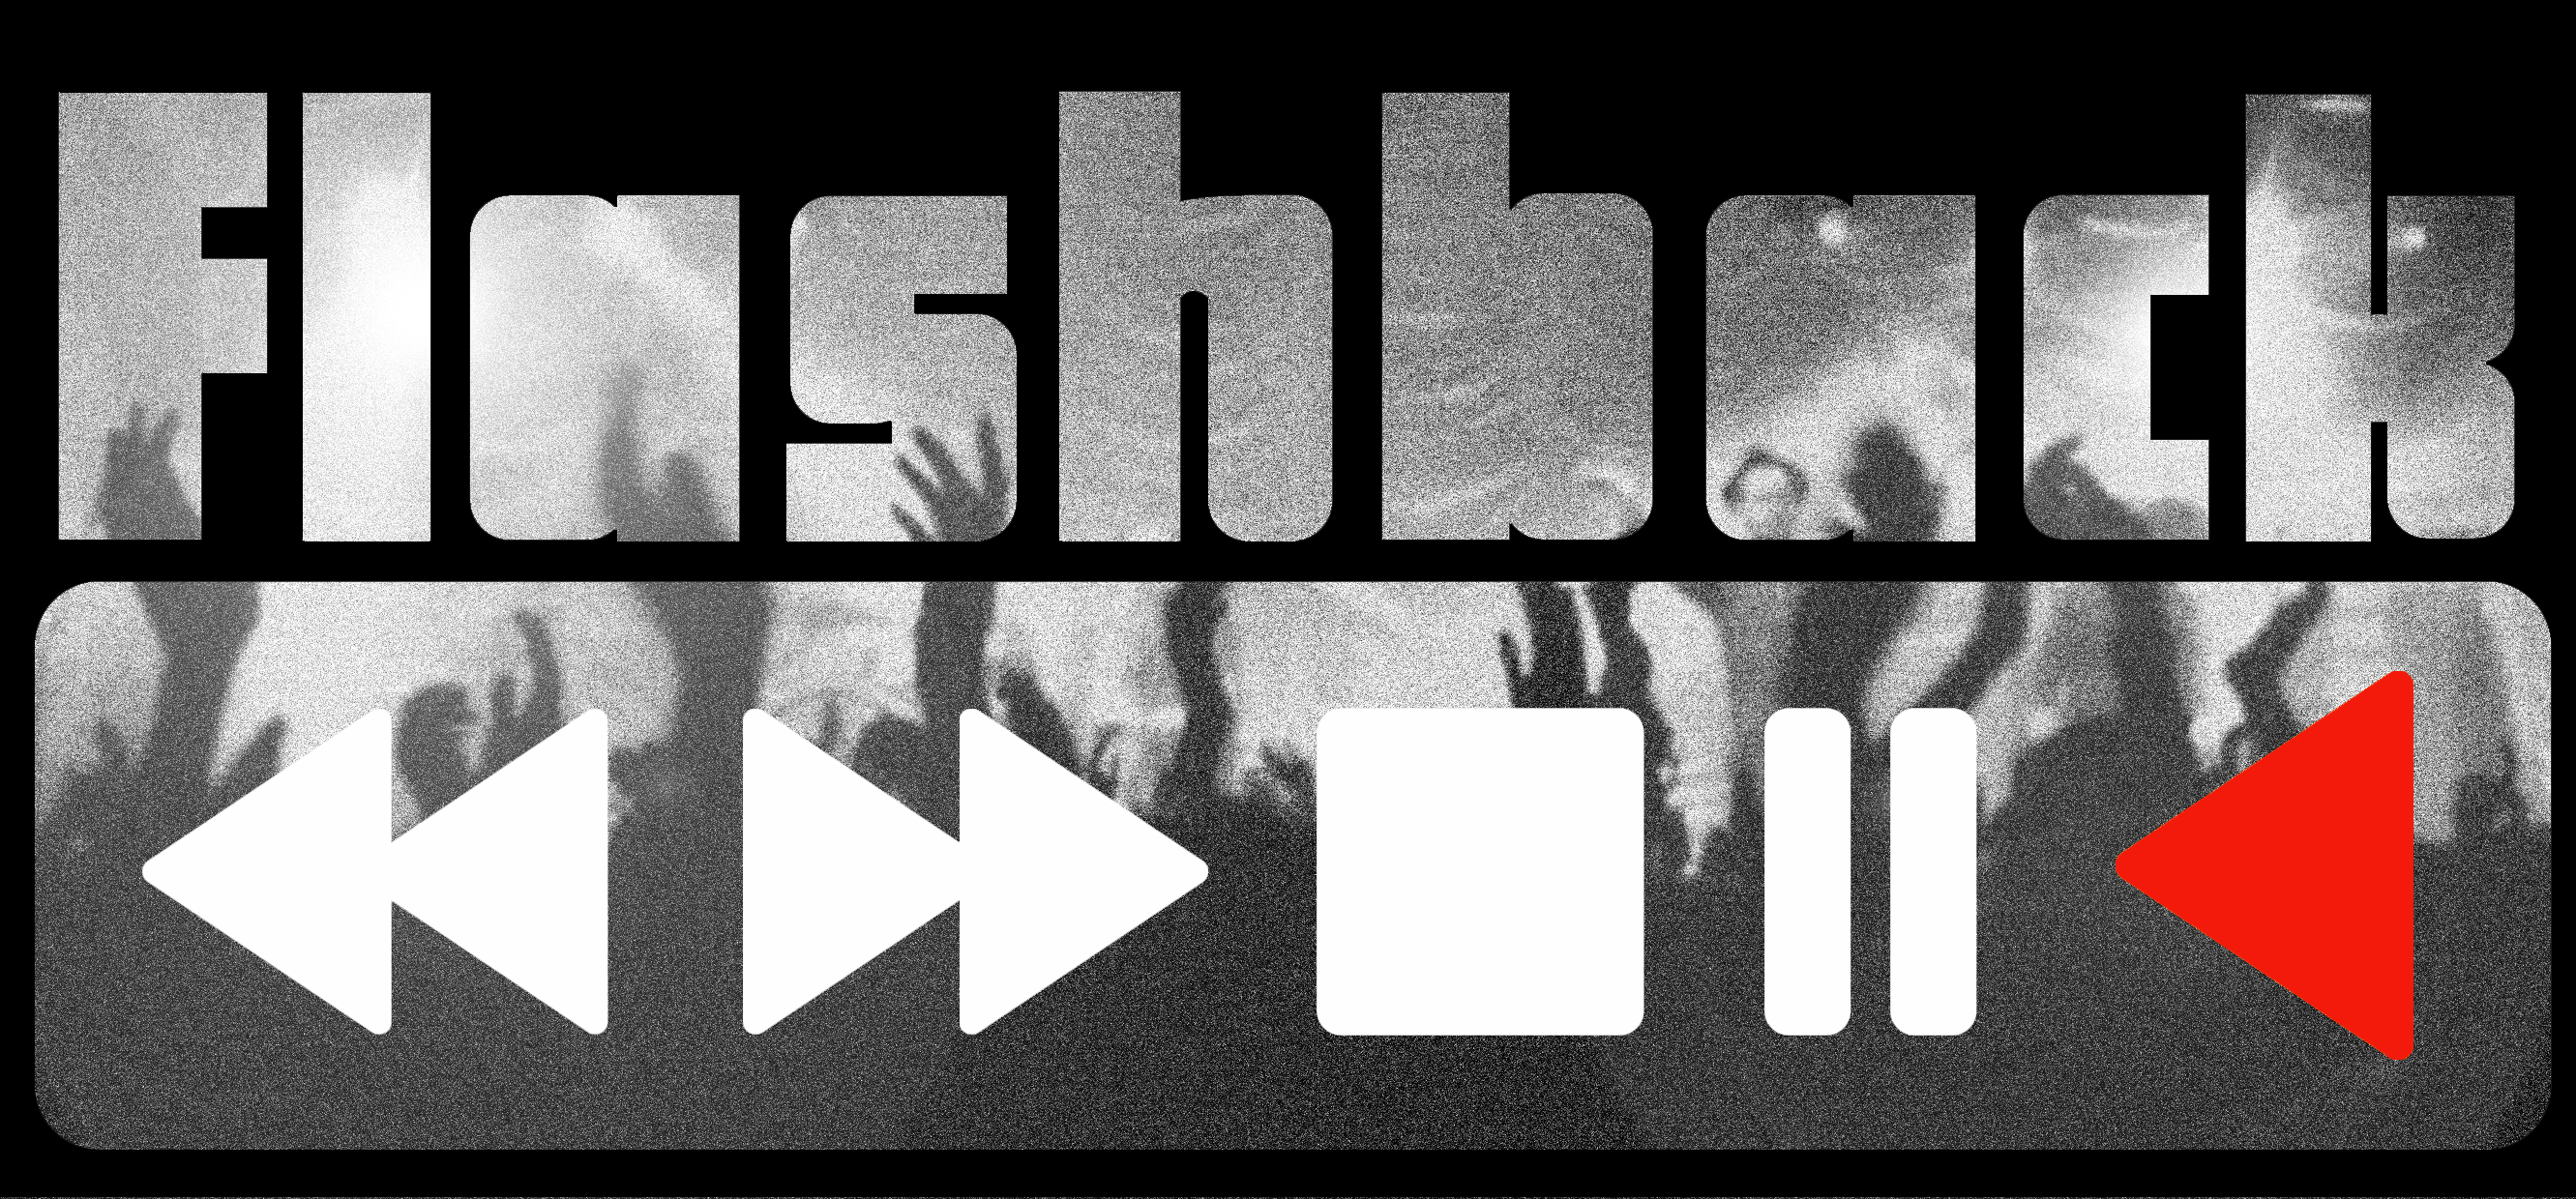 Noughties Flashback - Cobain Film